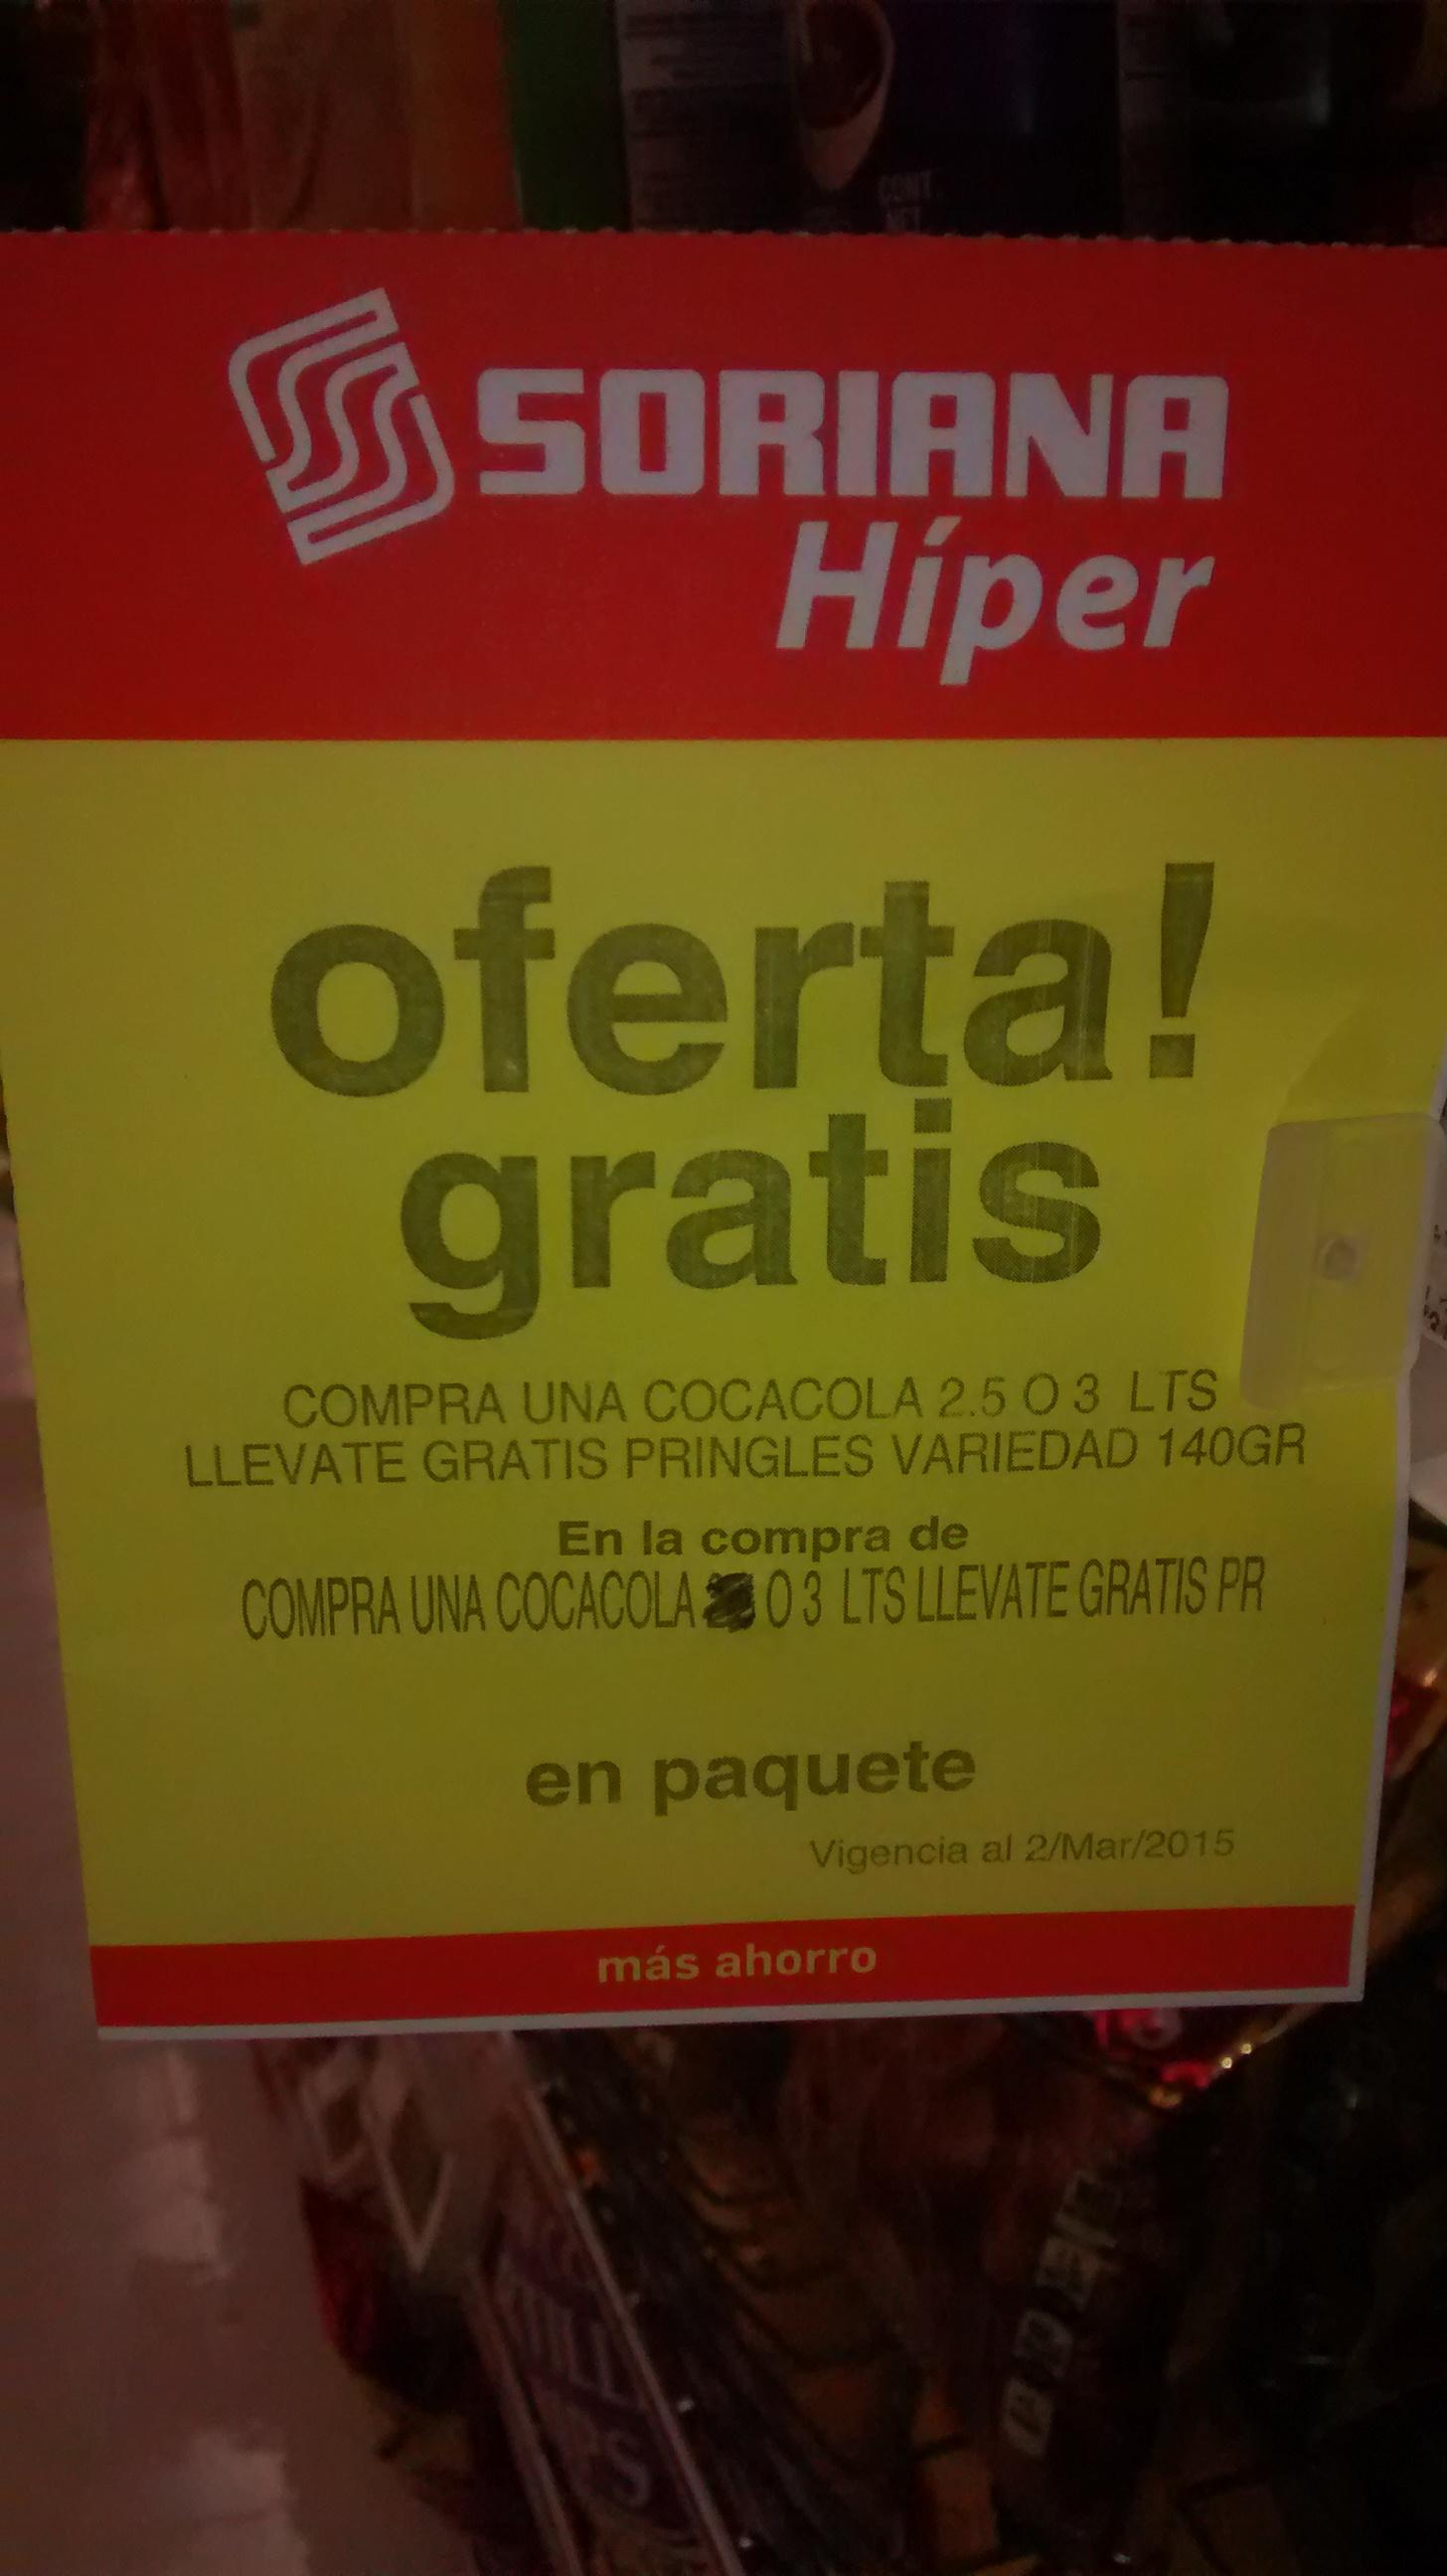 Pringles gratis en la compra de una coca cola de 3 Lts en Soriana